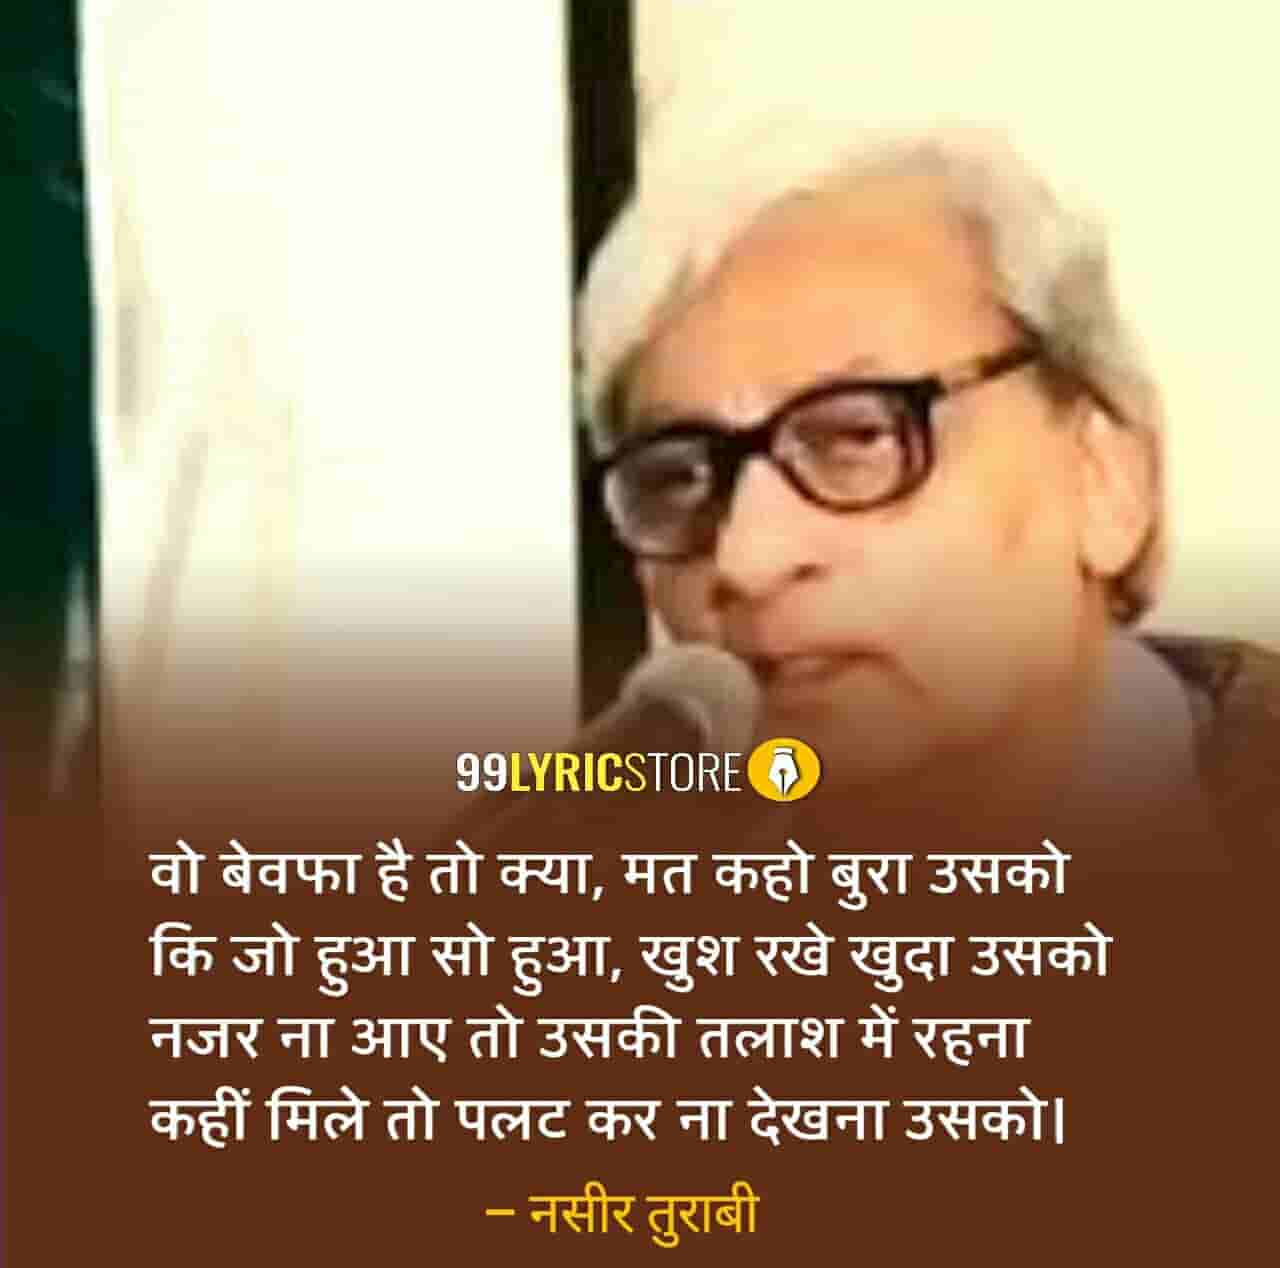 This beautiful Ghazal 'Wo Bewafa Hai To Kya' has written by Naseer Turabi.